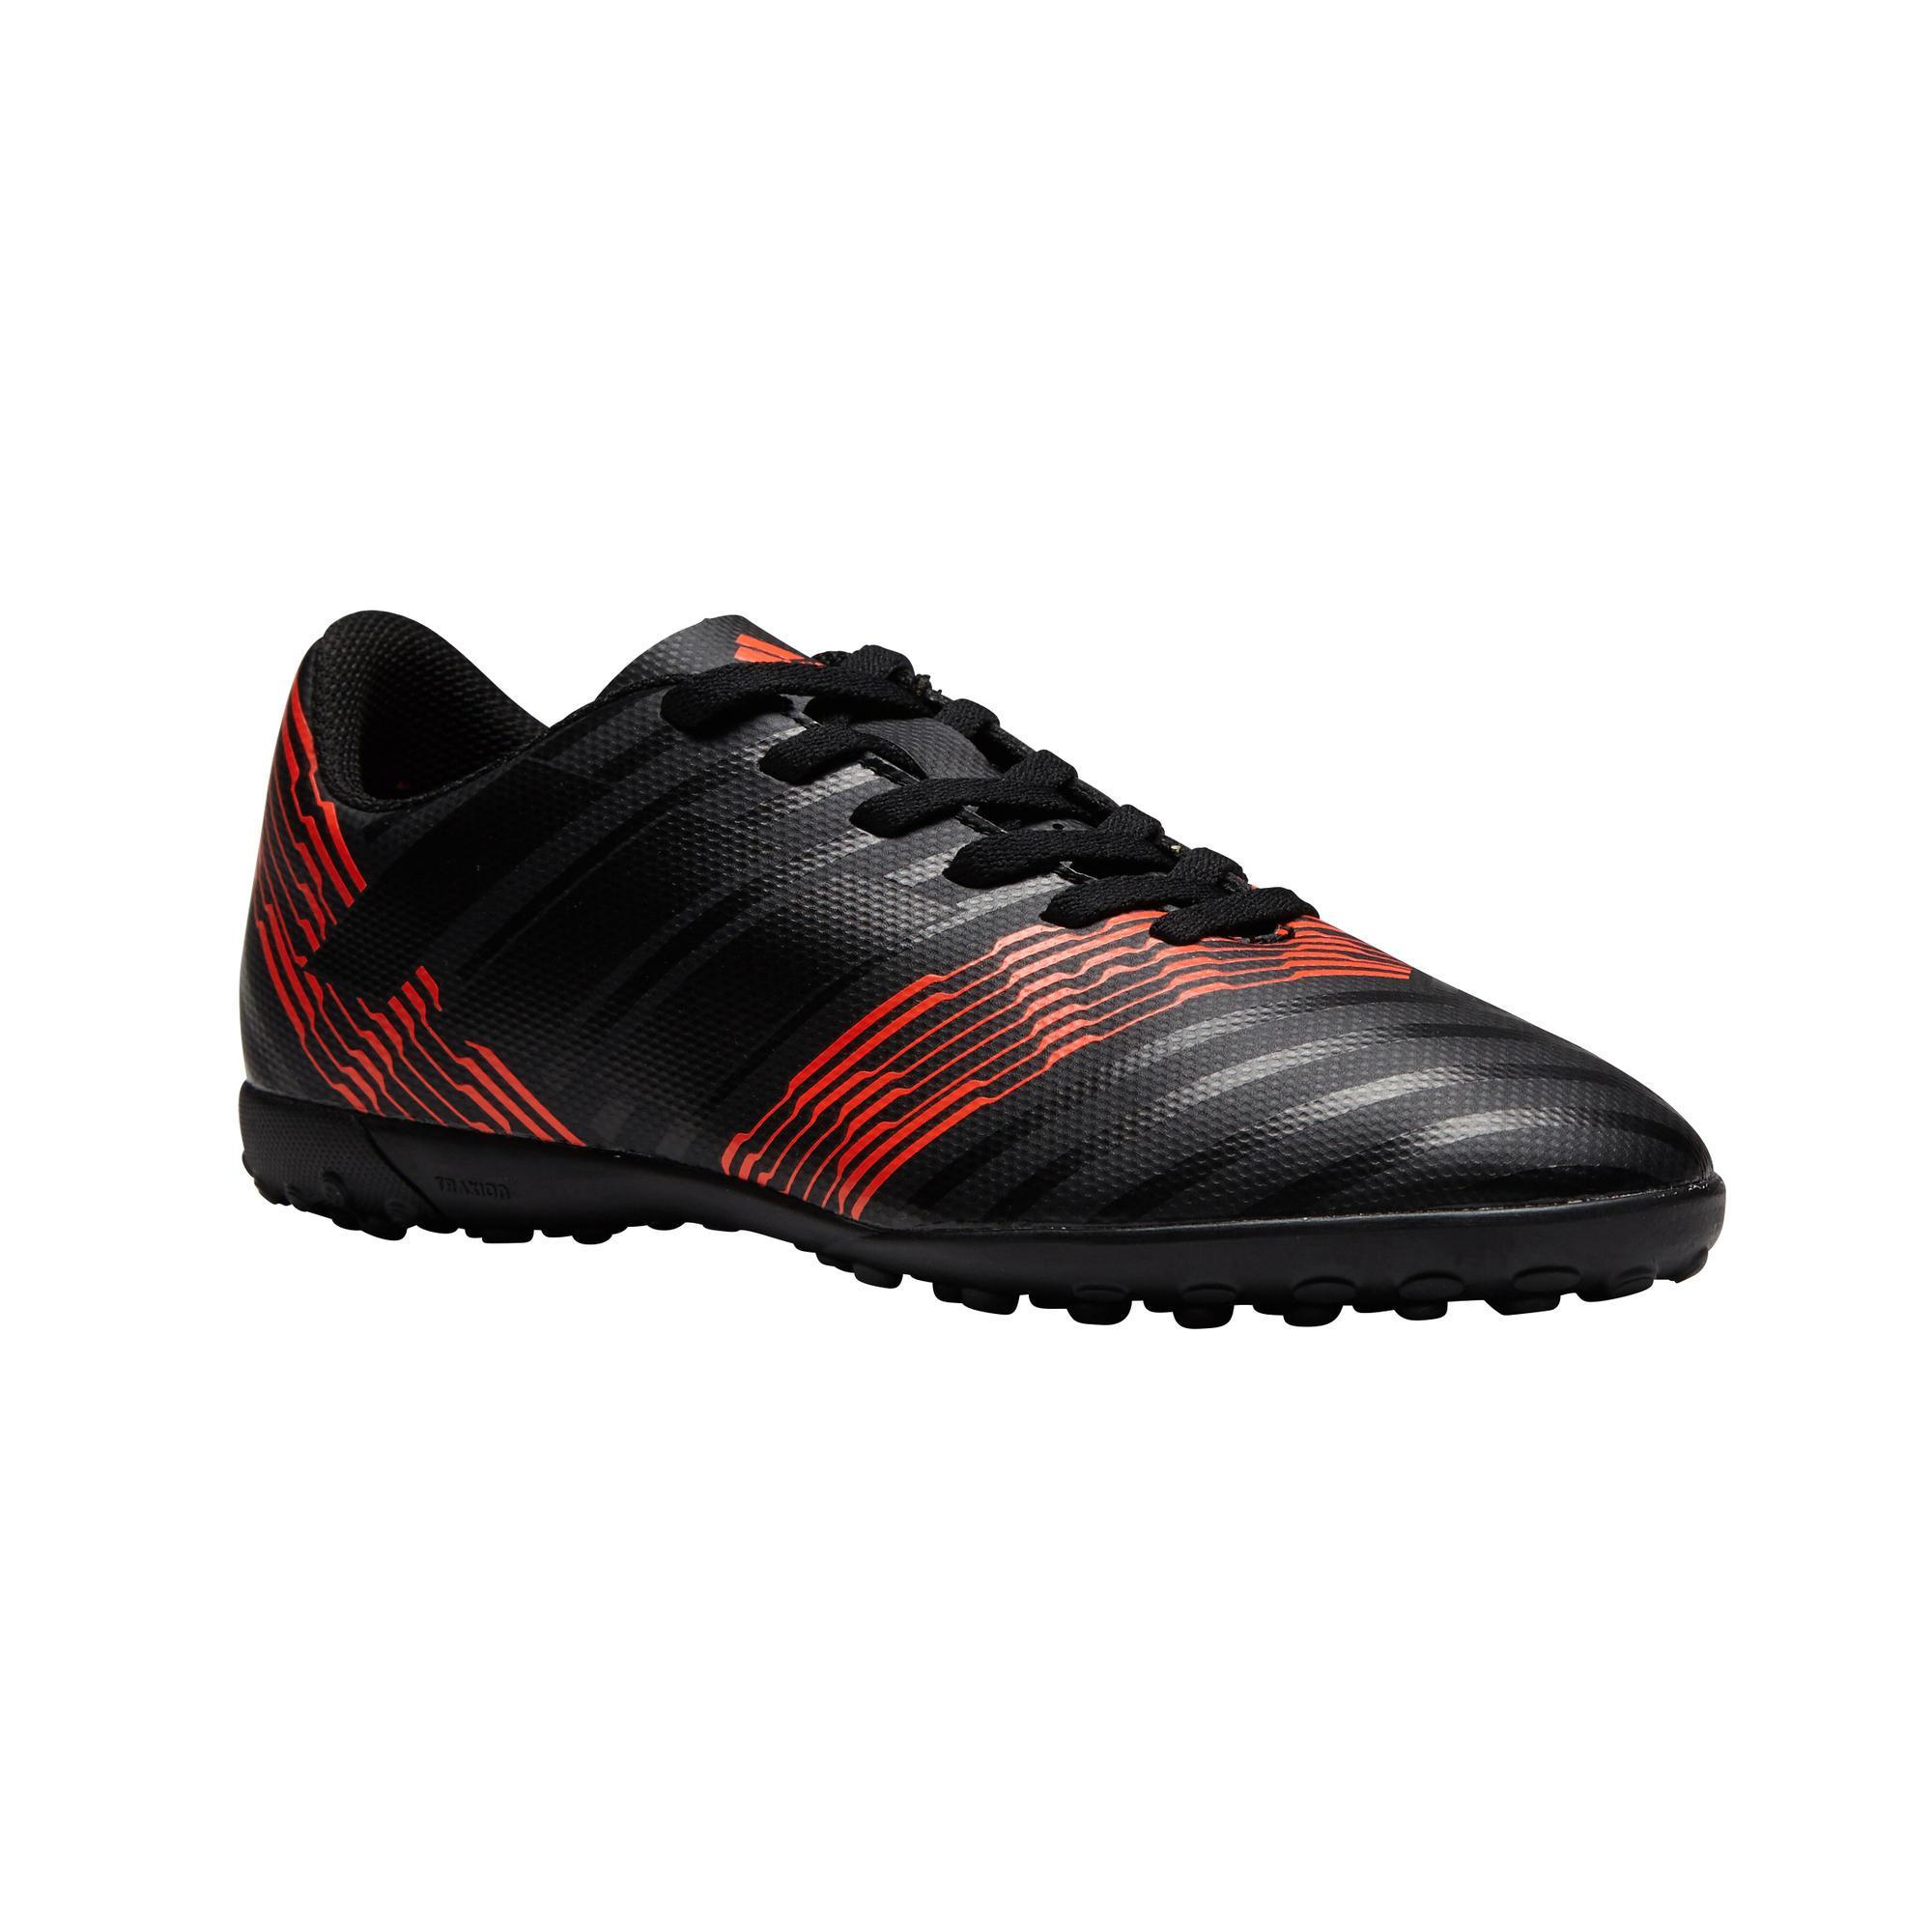 2375089 Adidas Voetbalschoenen kind Nemeziz Tango 18.3 rood zwart